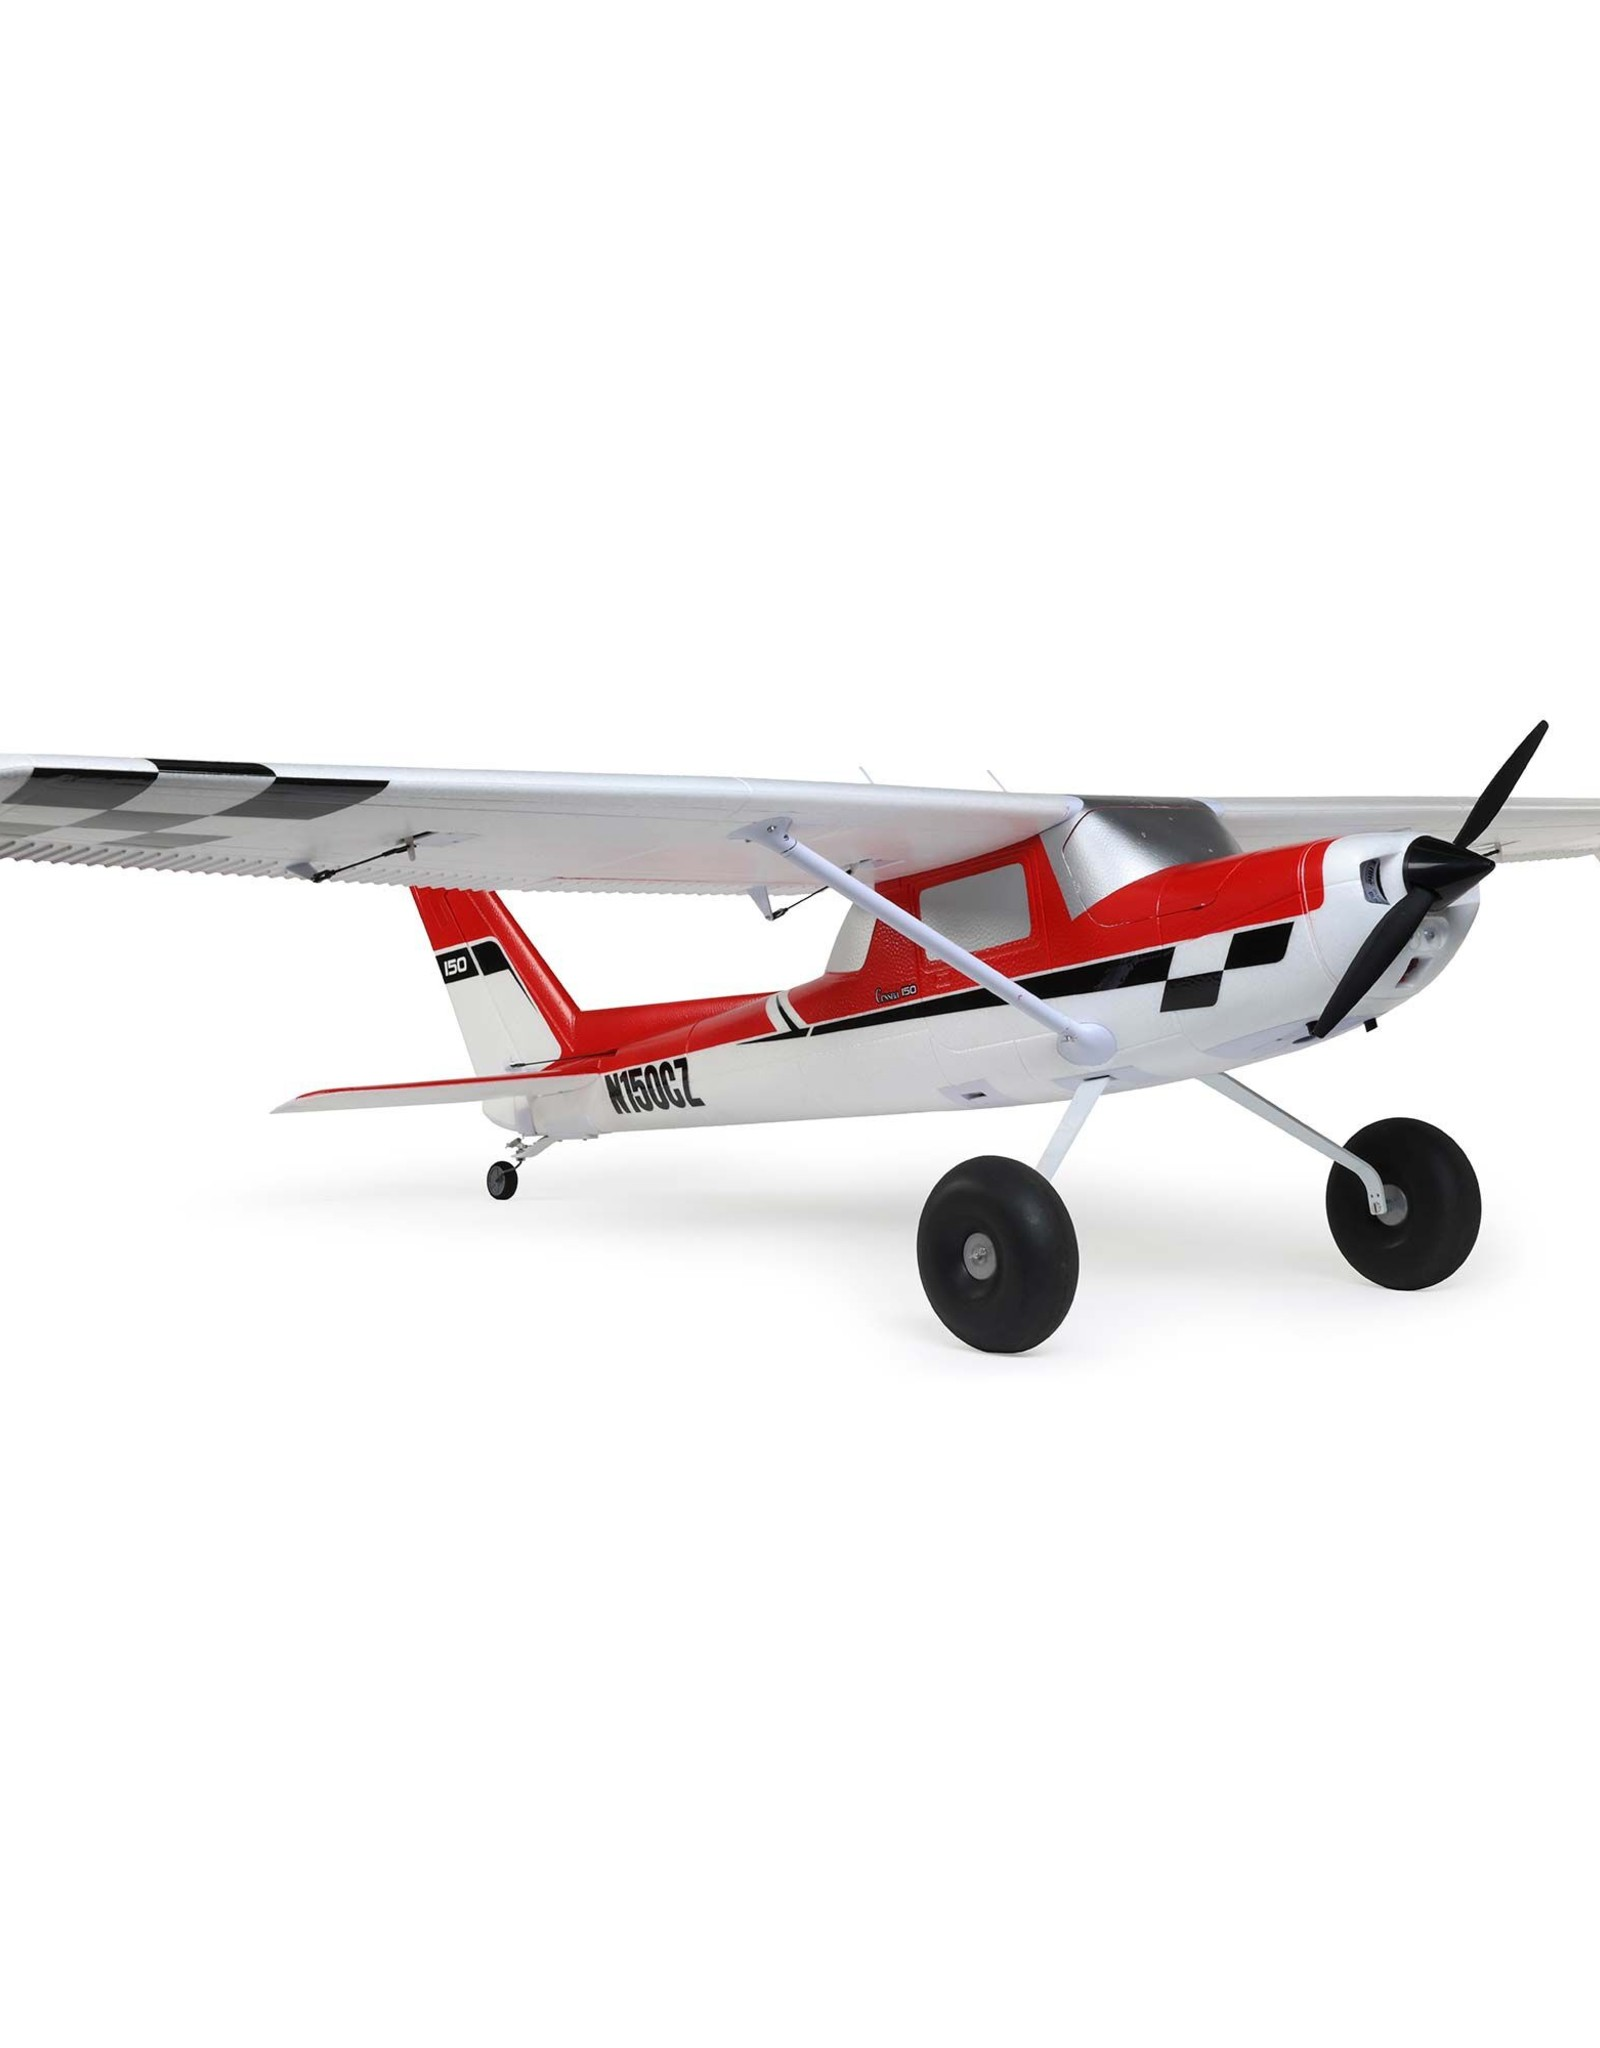 eflite EFL12750Carbon-Z Cessna 150T 2.1m BNF Basic